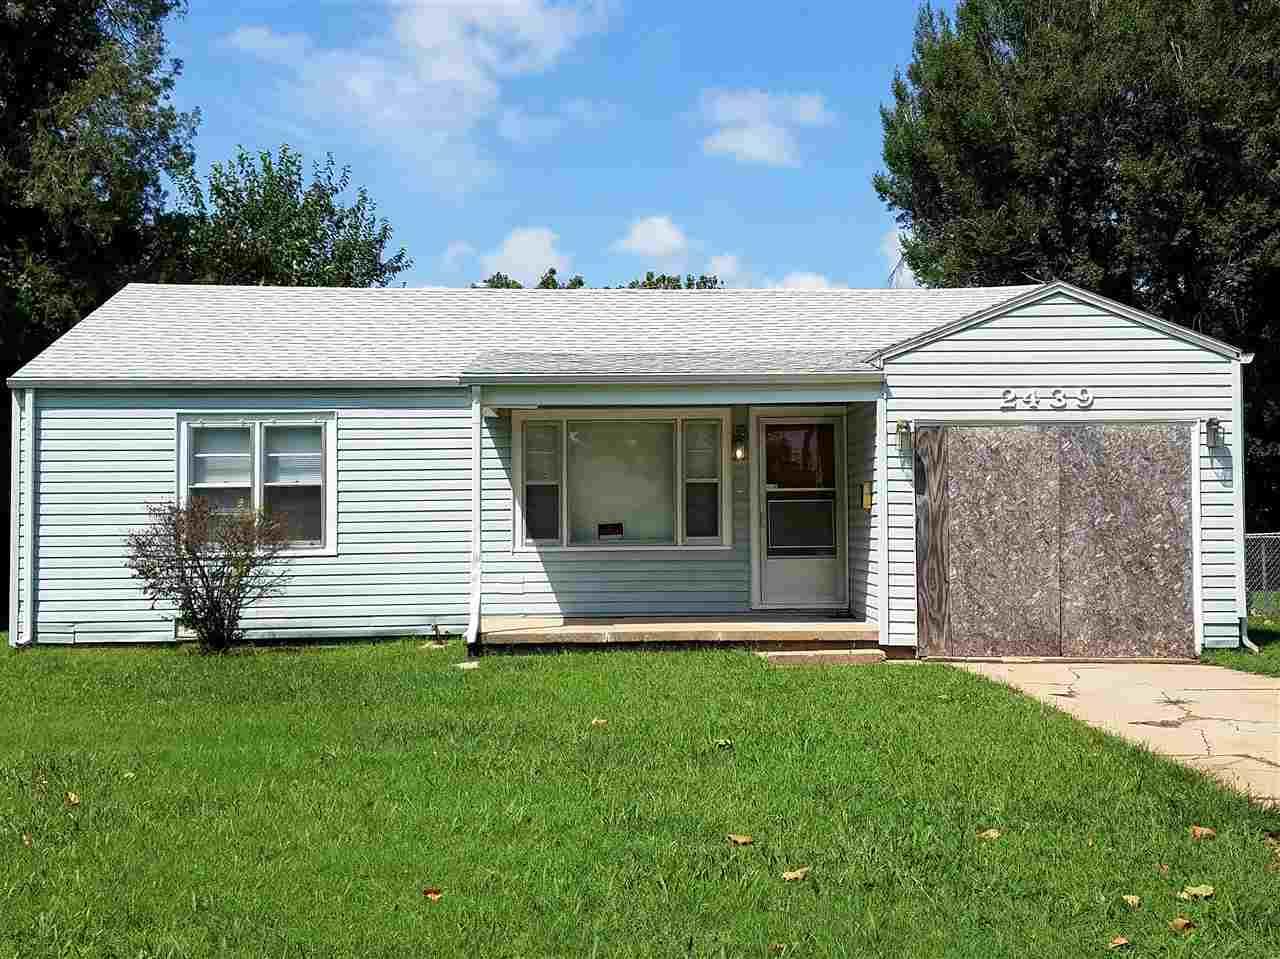 2439 N Lorraine St., Wichita, KS 67219